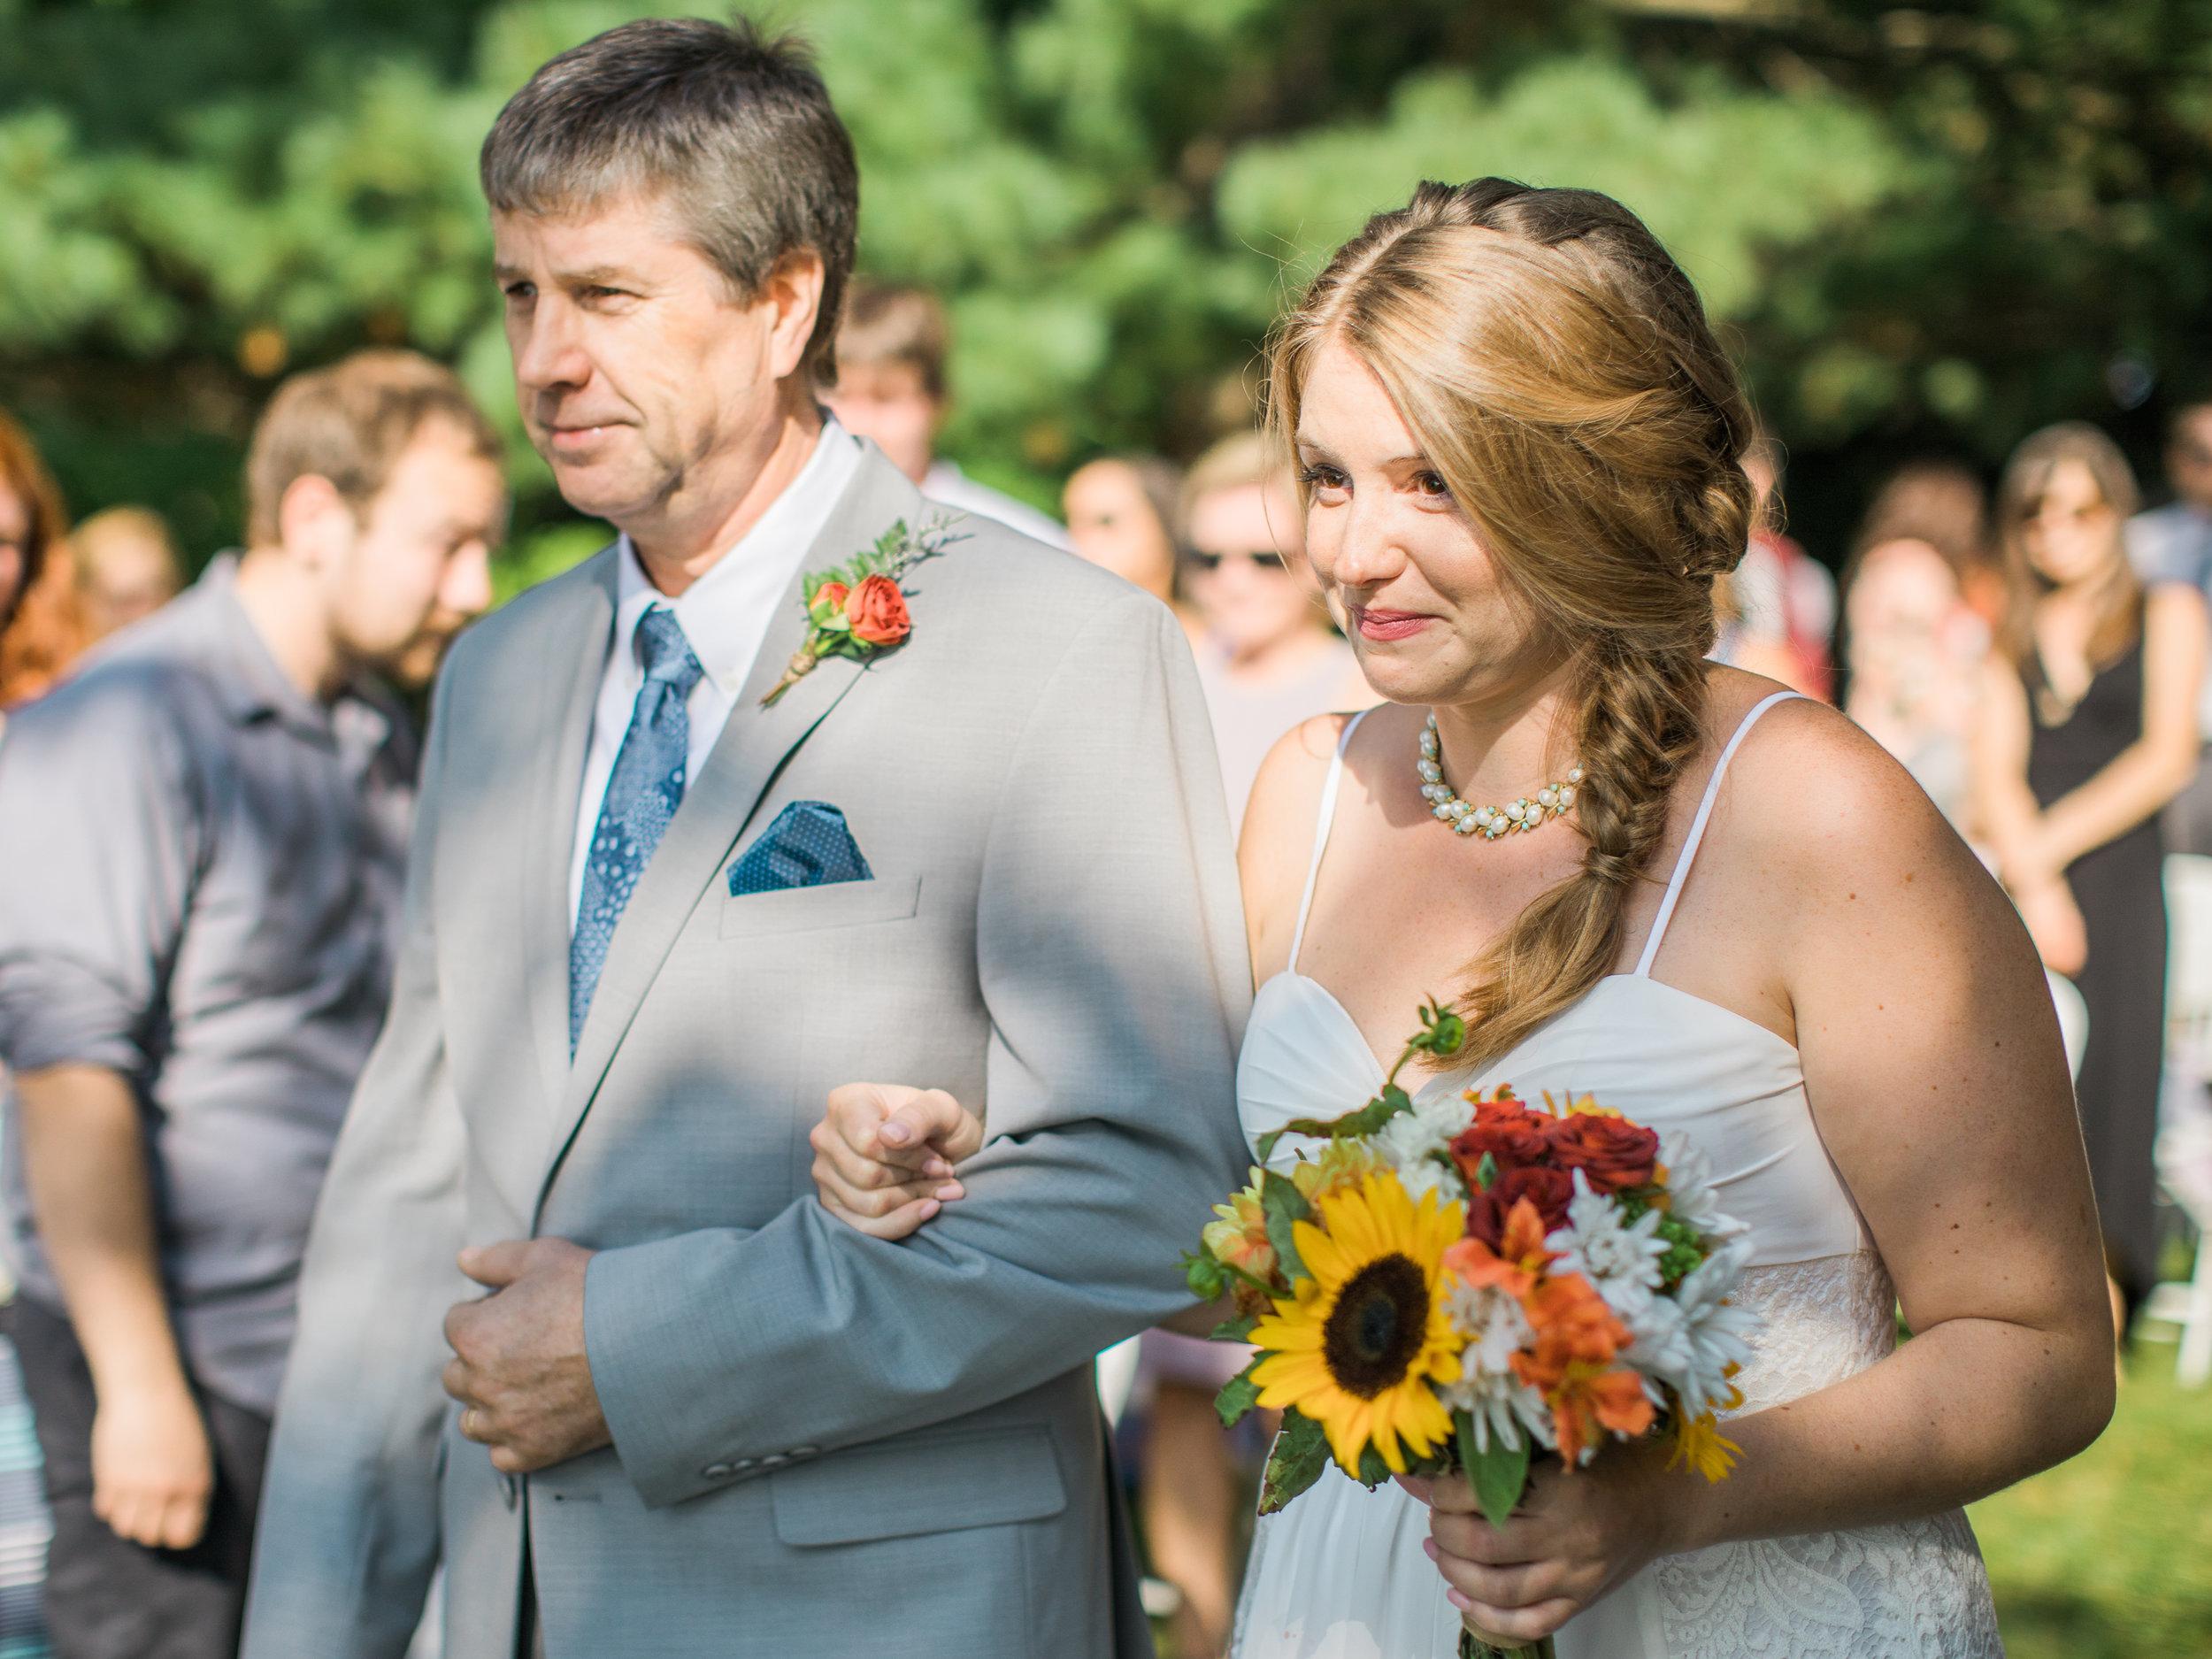 Minnesota Lakeside destination wedding near Brainerd